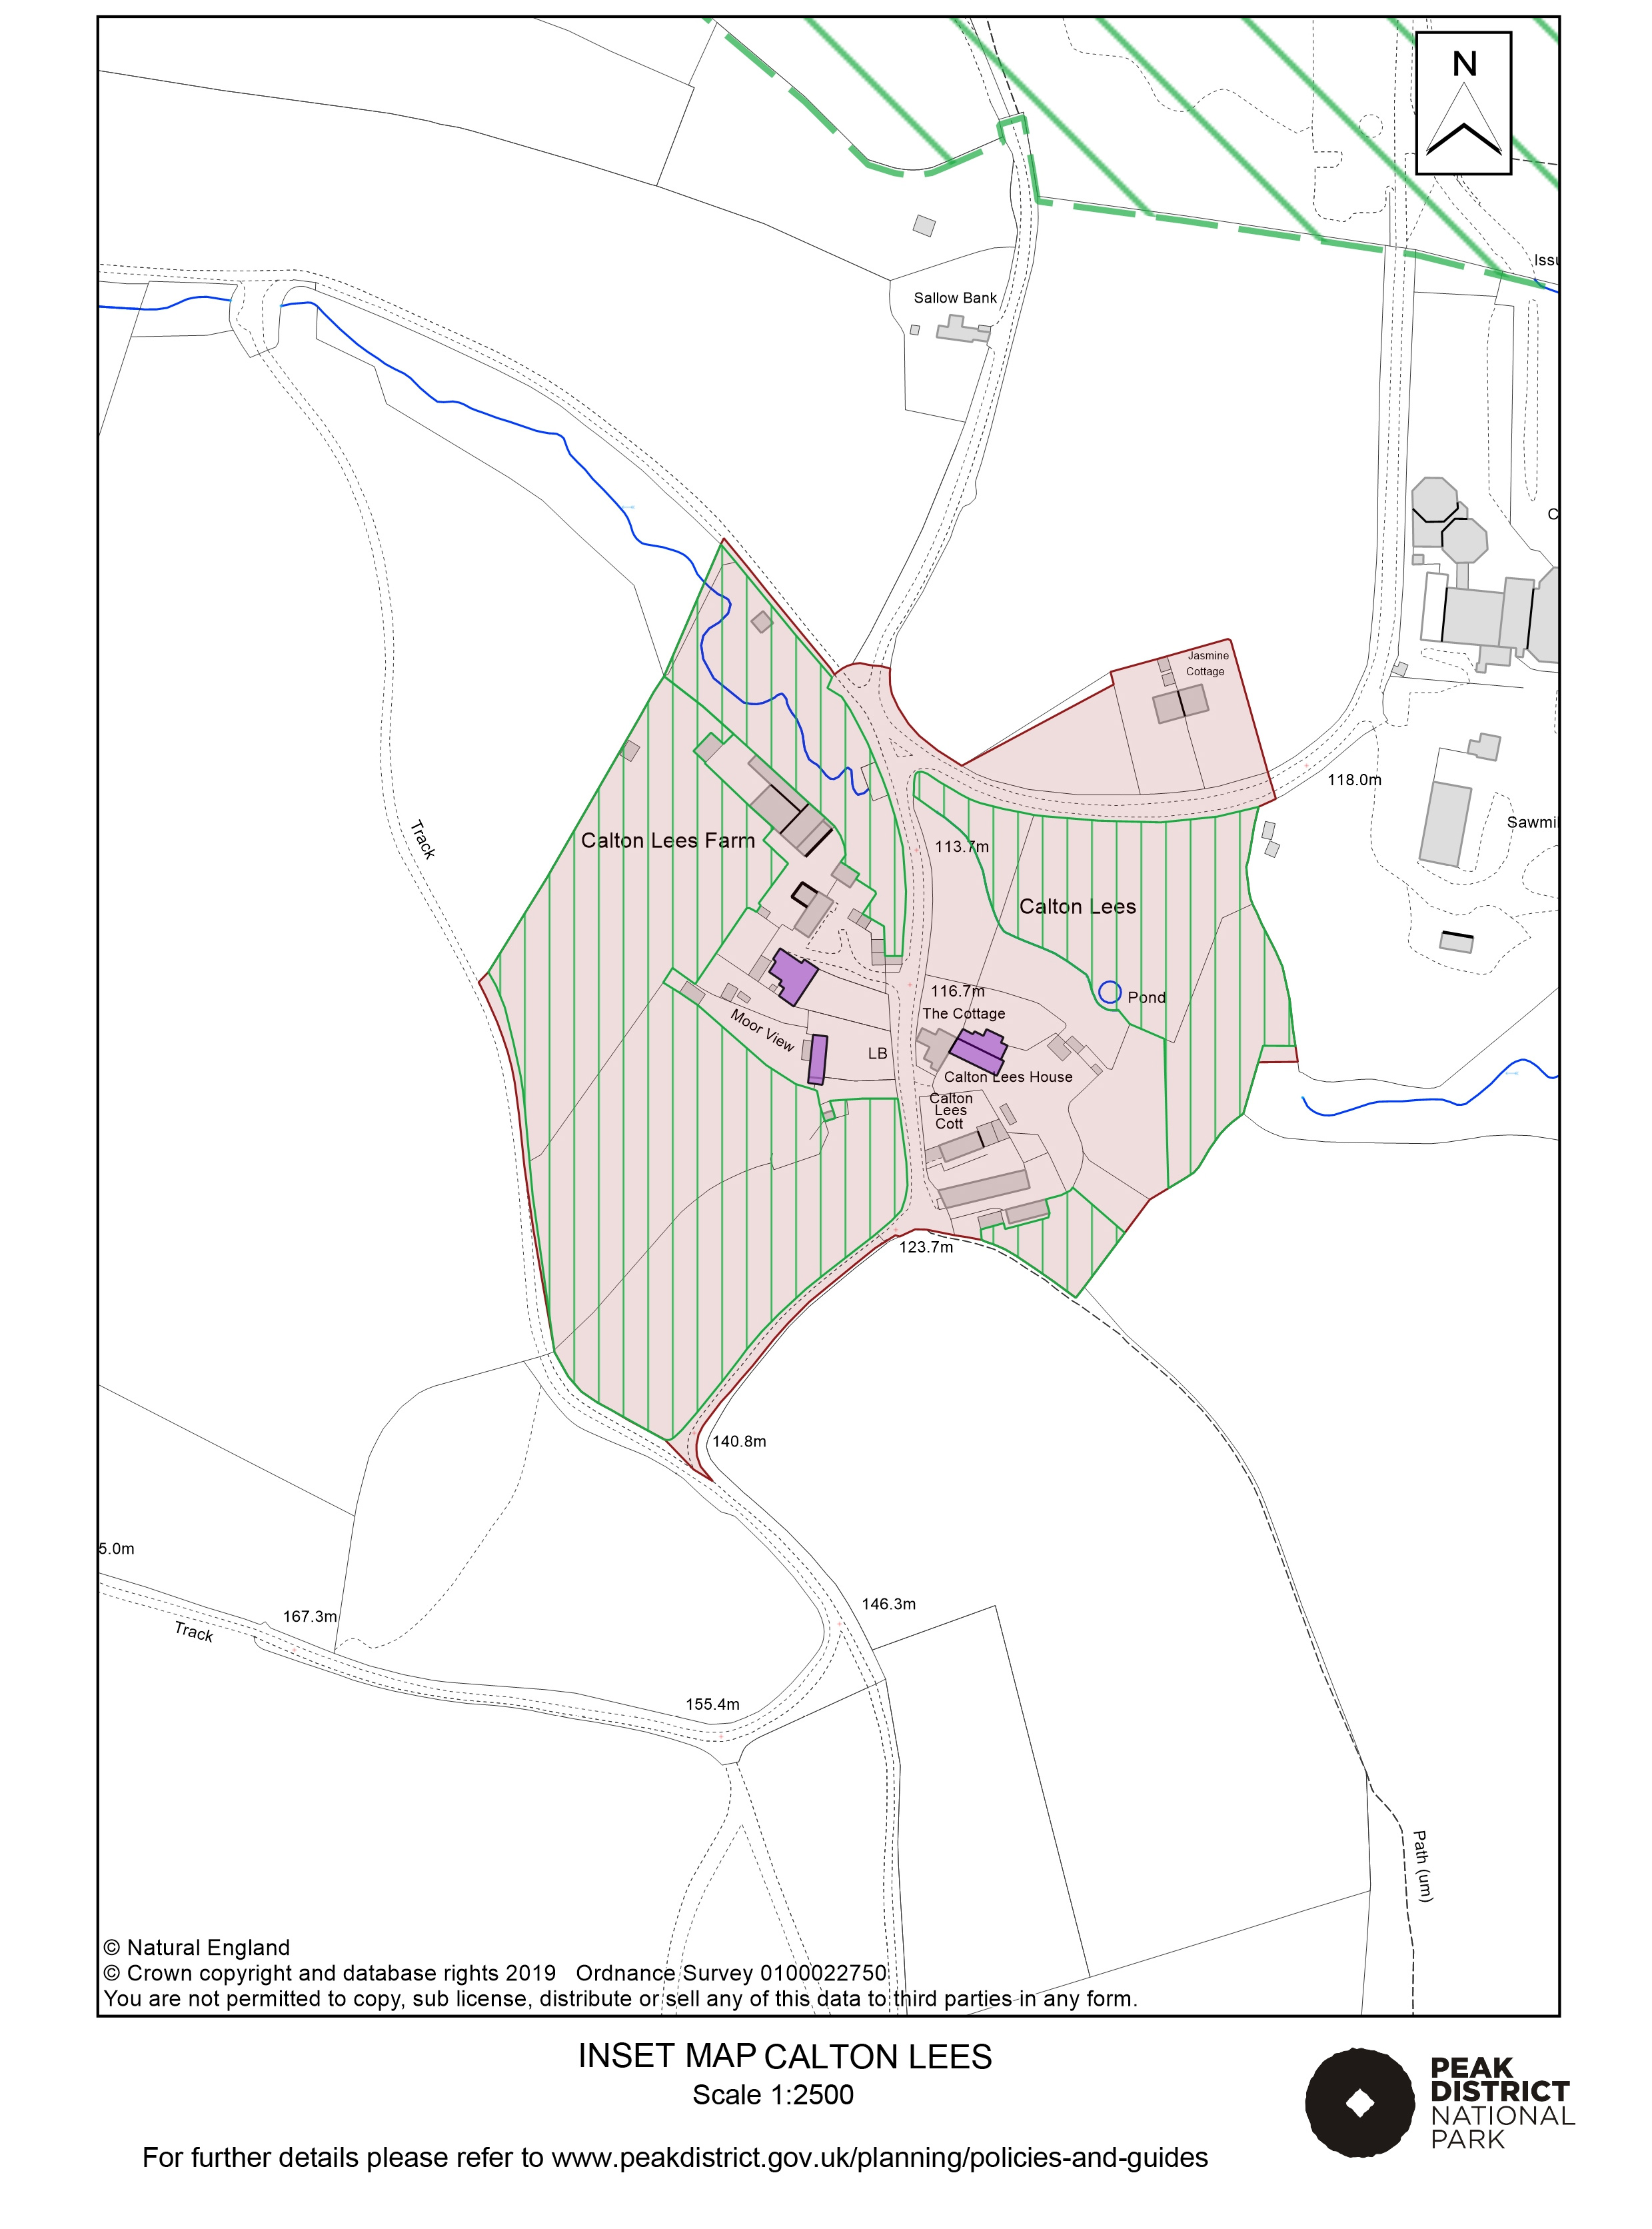 Local Plan Proposals Map: Calton Lees